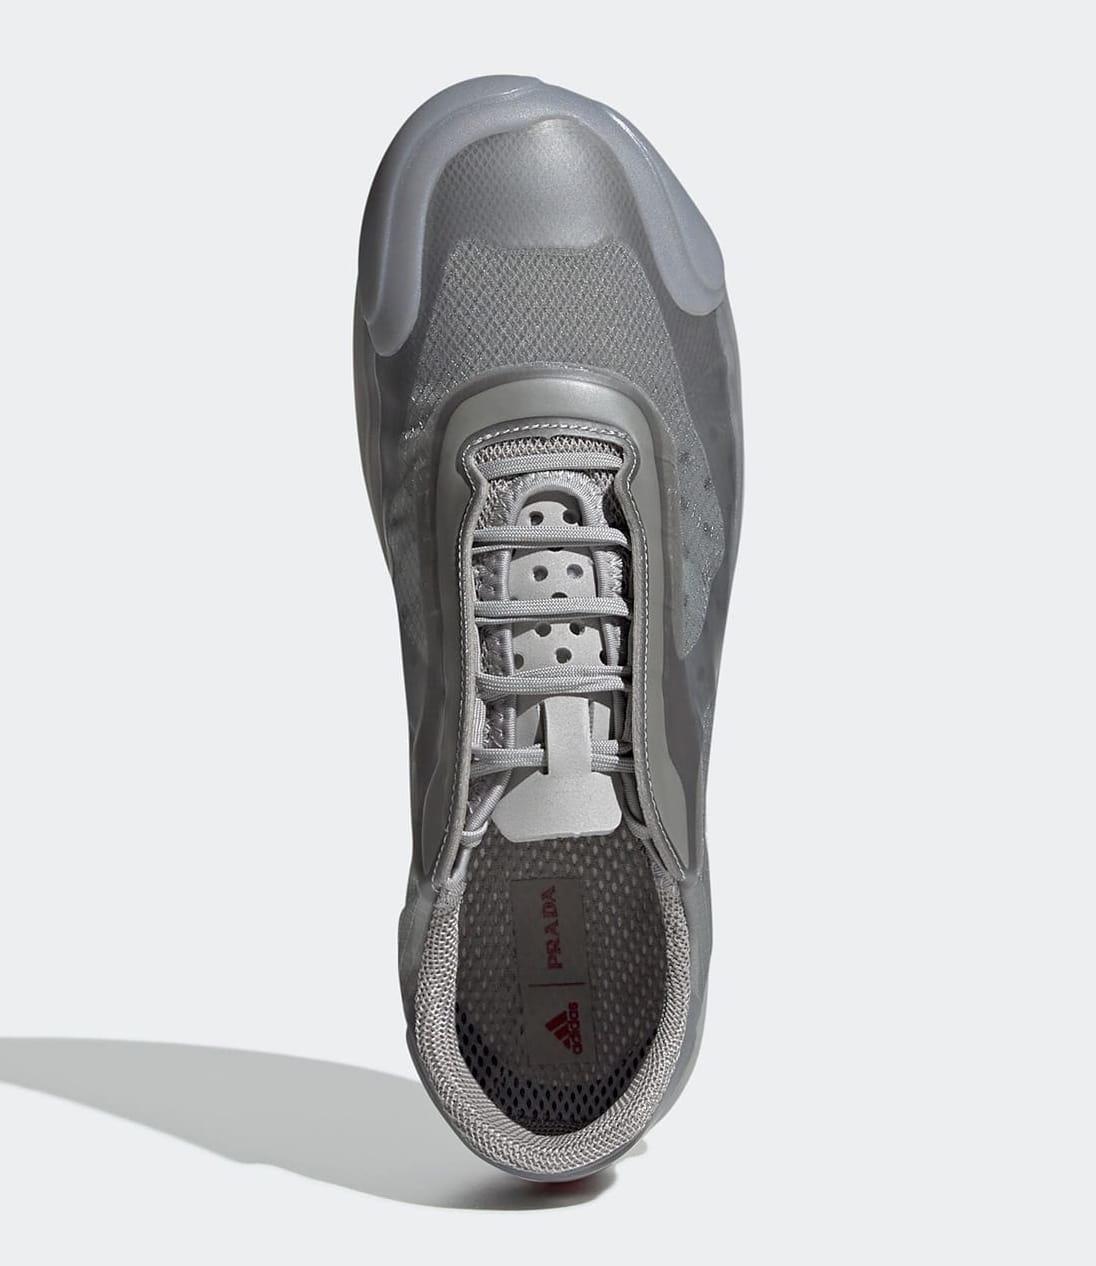 Prada x Adidas Luna Rossa 21 Grey FW1079 Top